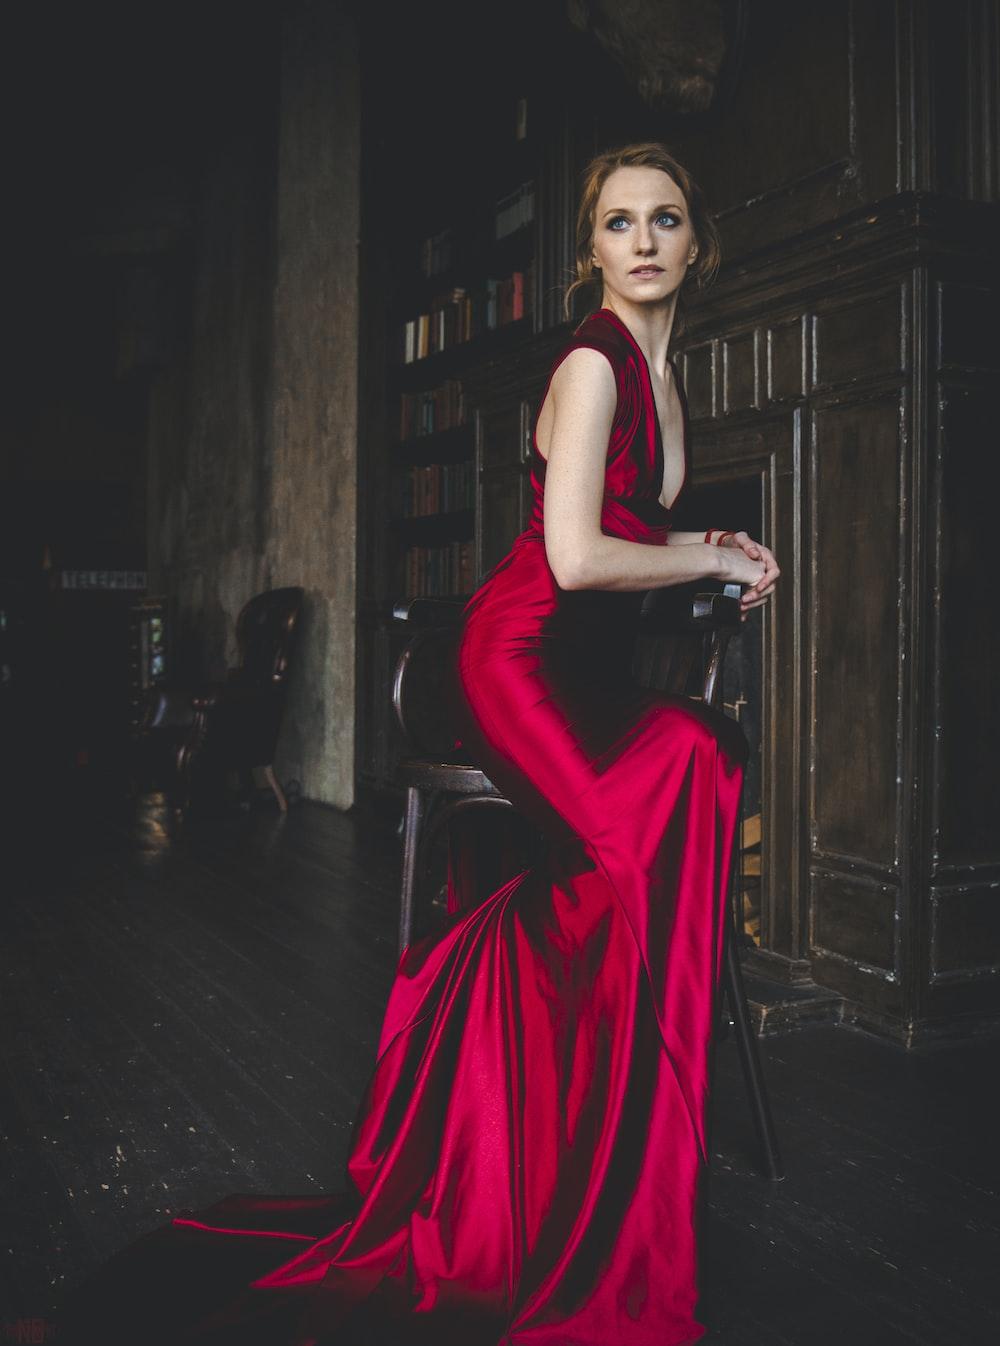 woman in red sleeveless dress standing on black floor